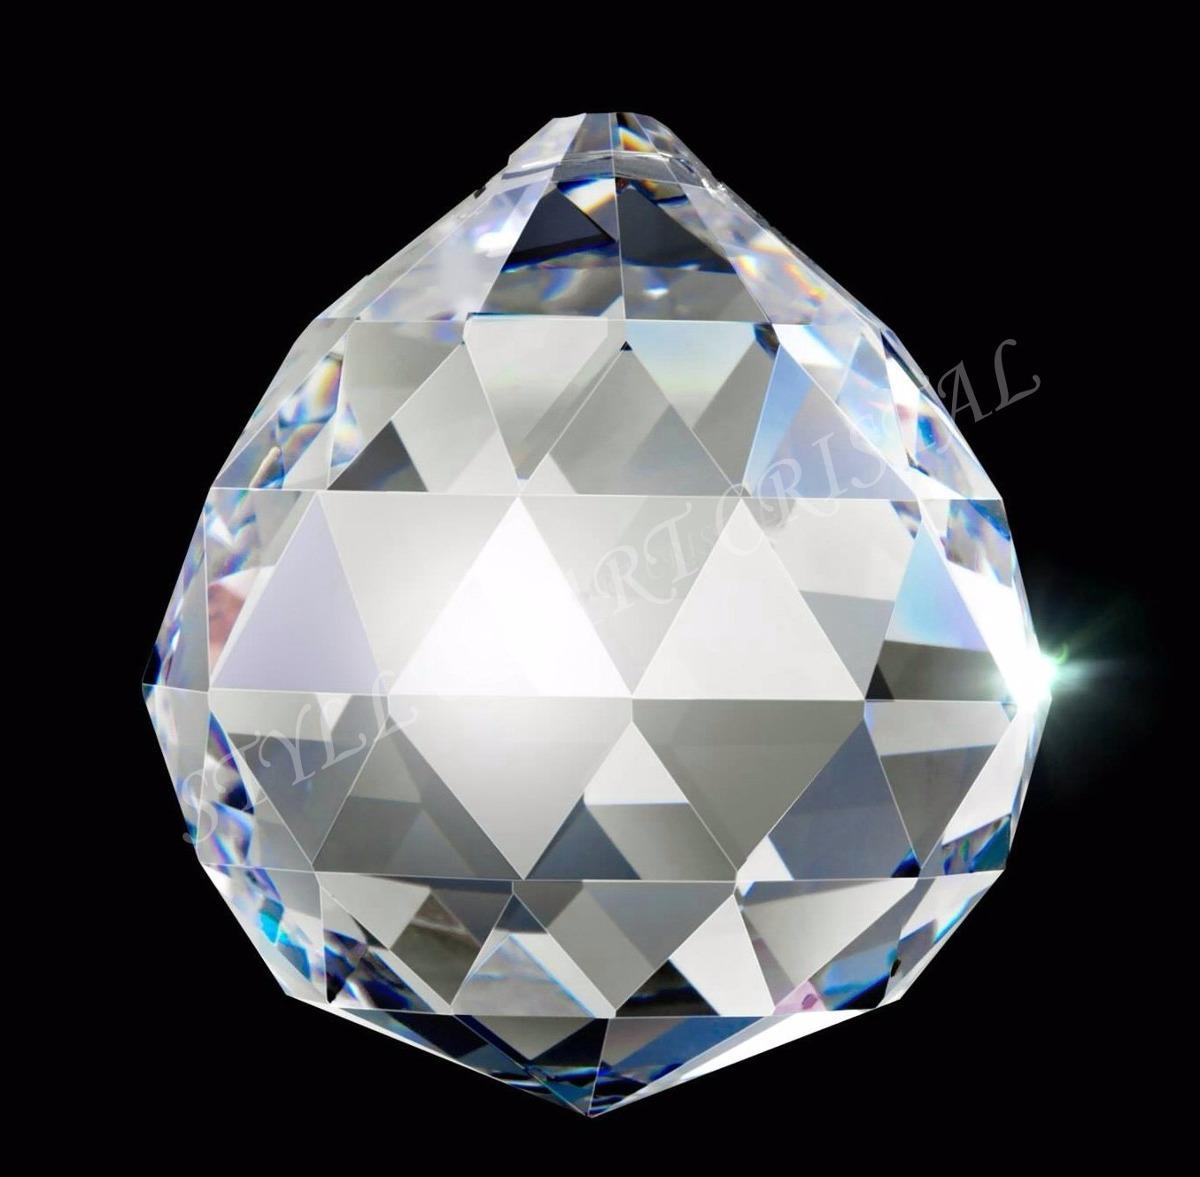 A bola de cristal online dating 5